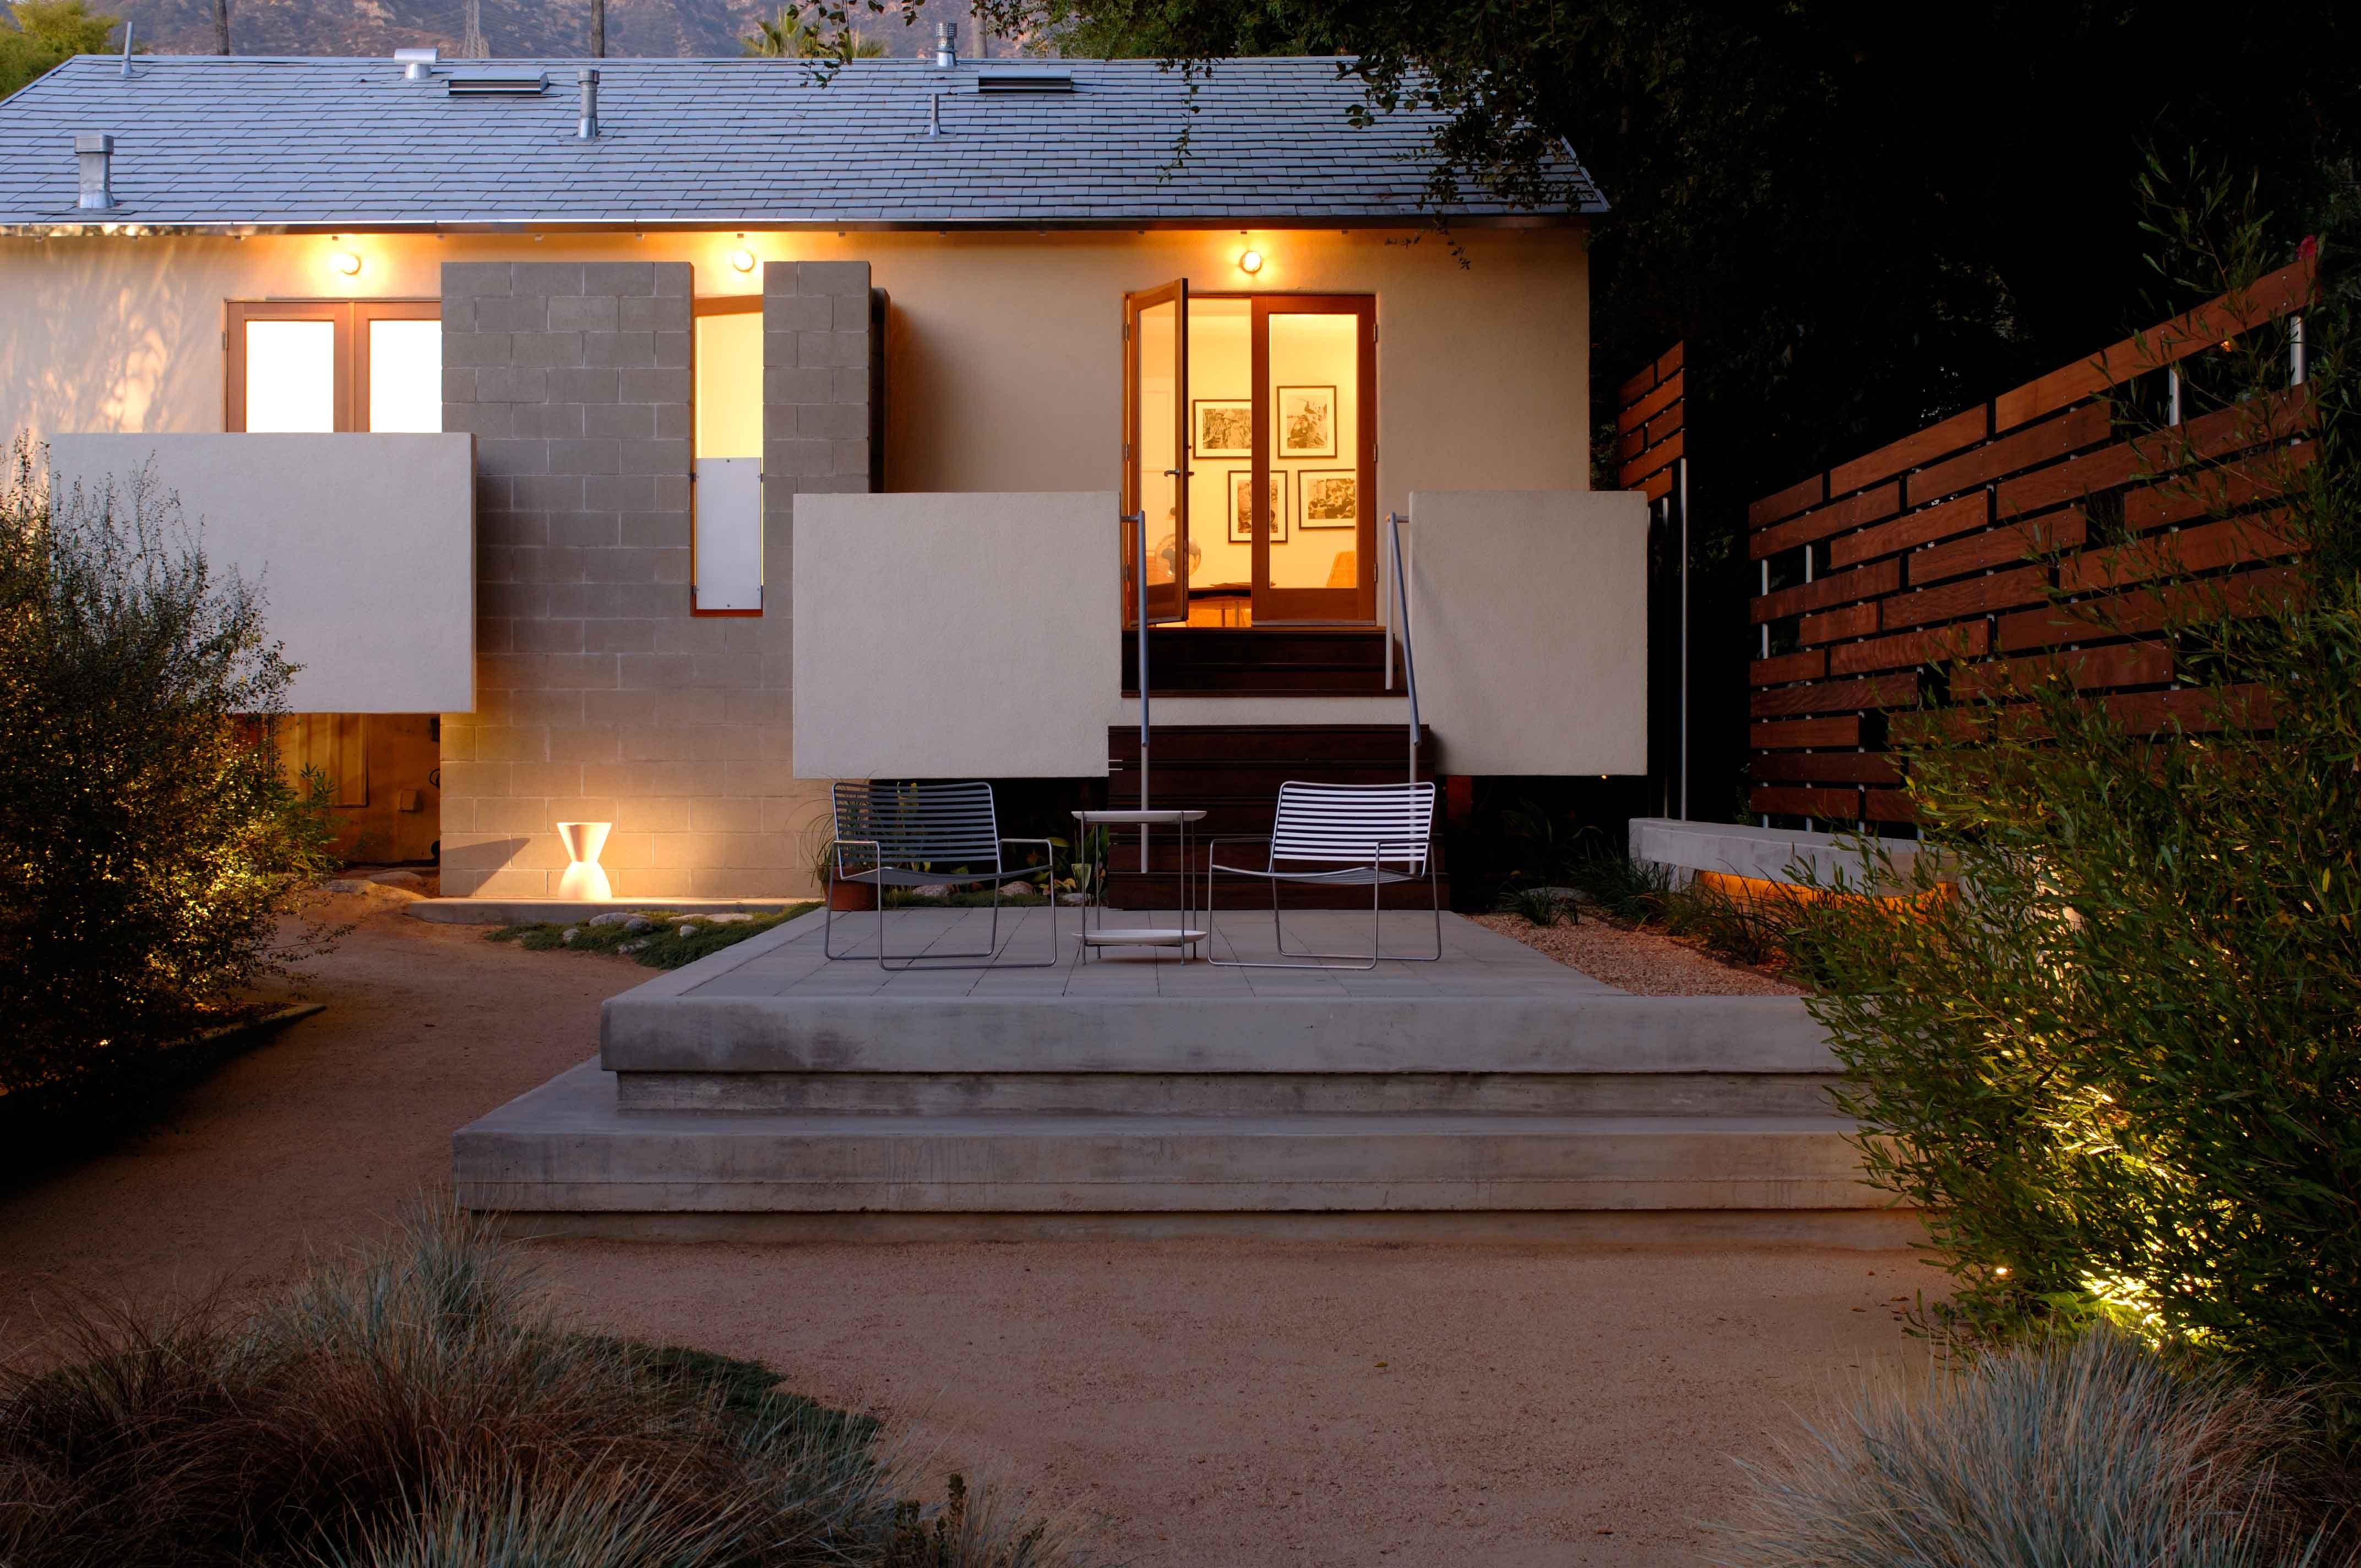 Fer murphy levitz residence frontpatio 7